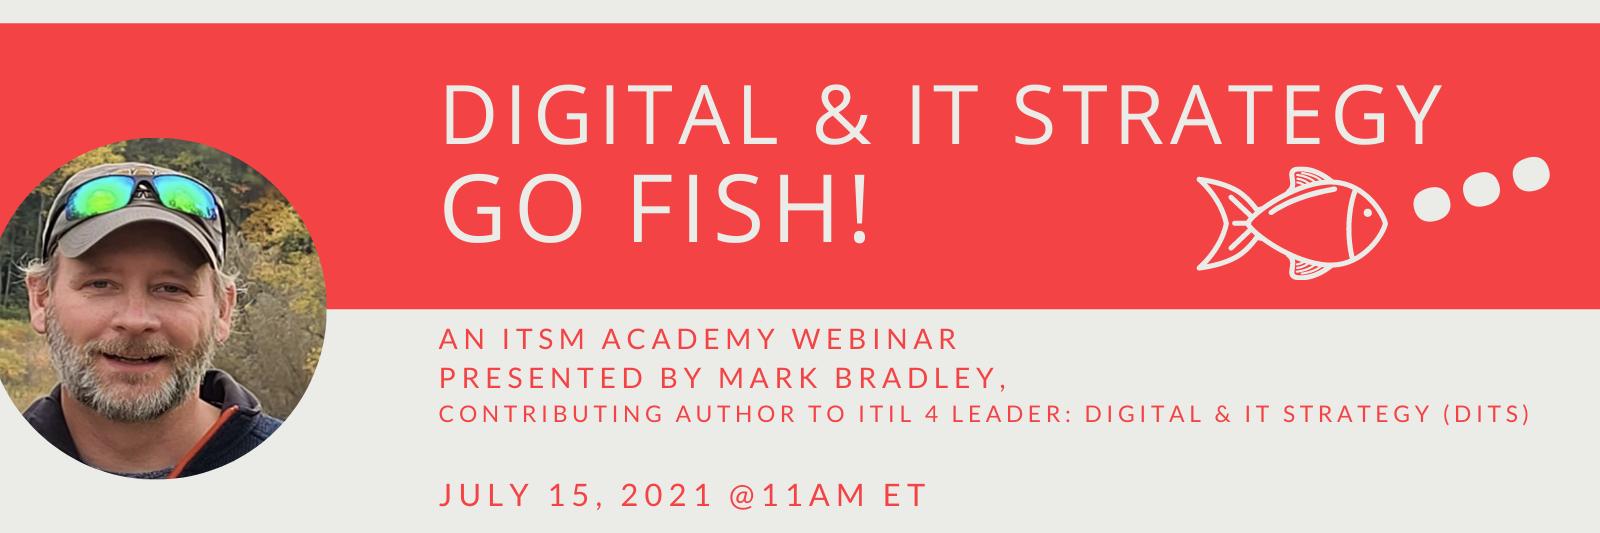 Digital & IT Strategy - Go Fish!